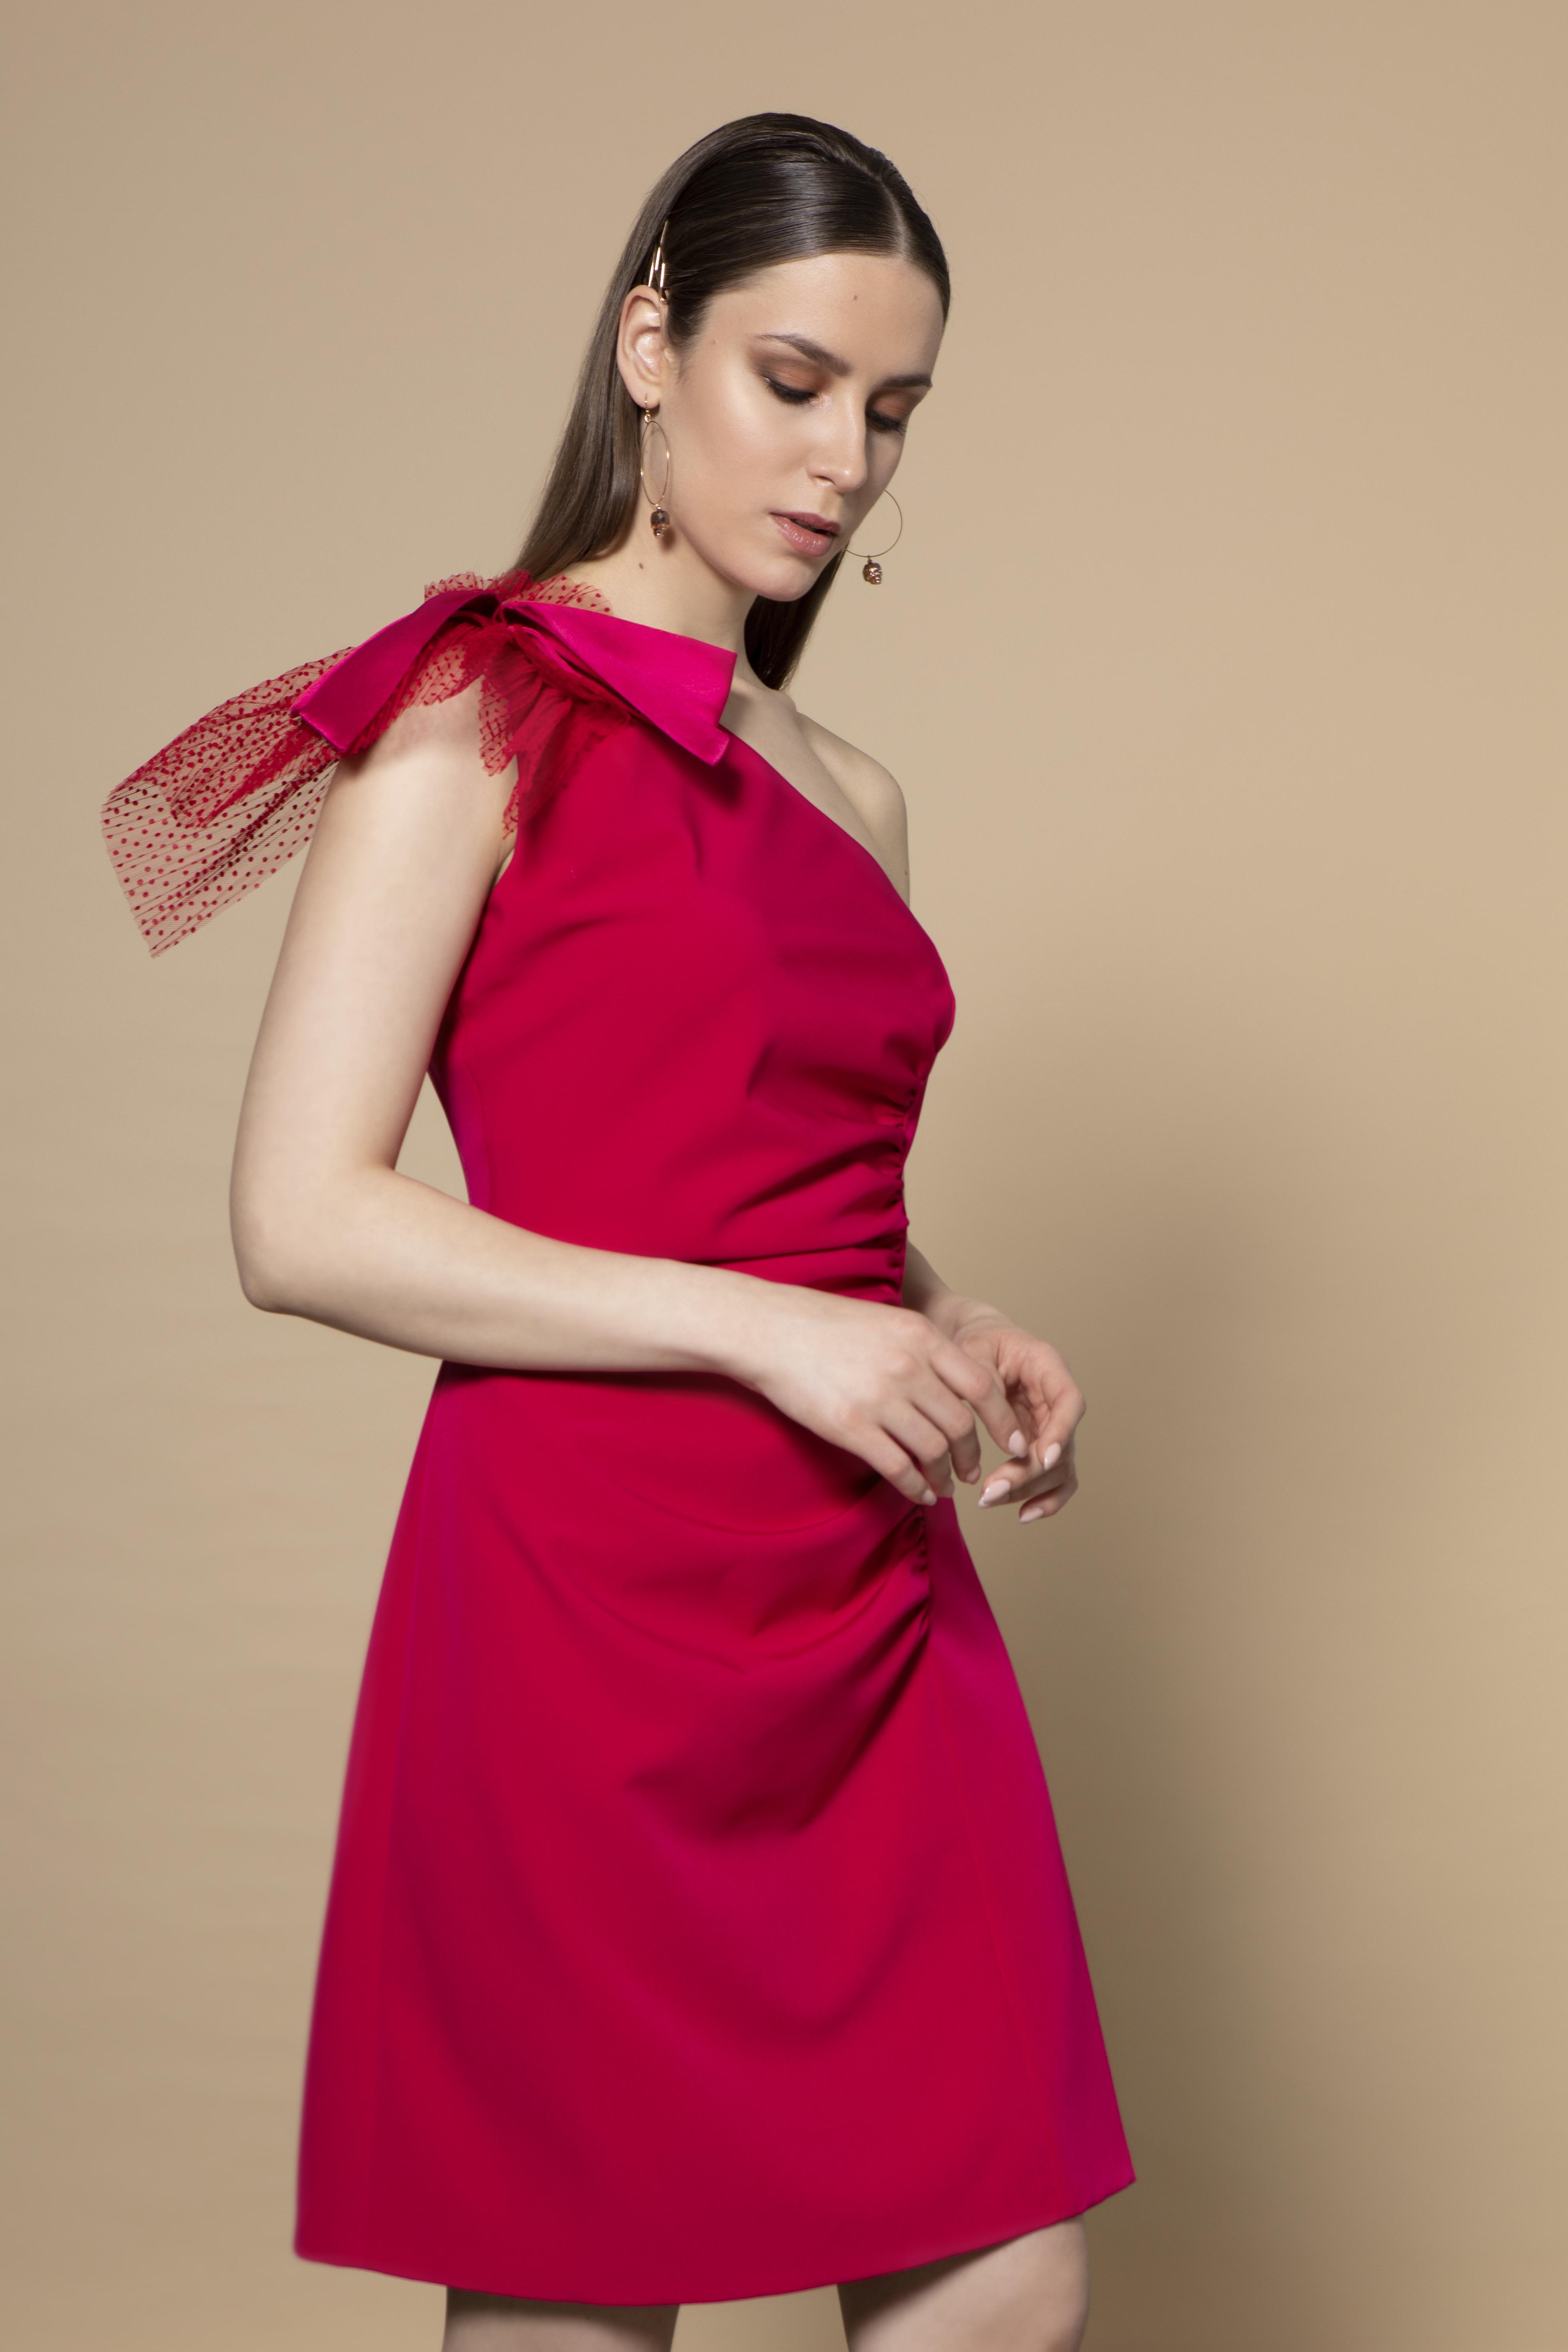 Lexi Dress in Pink with Shoulder Detail CKSISLEXIPINK